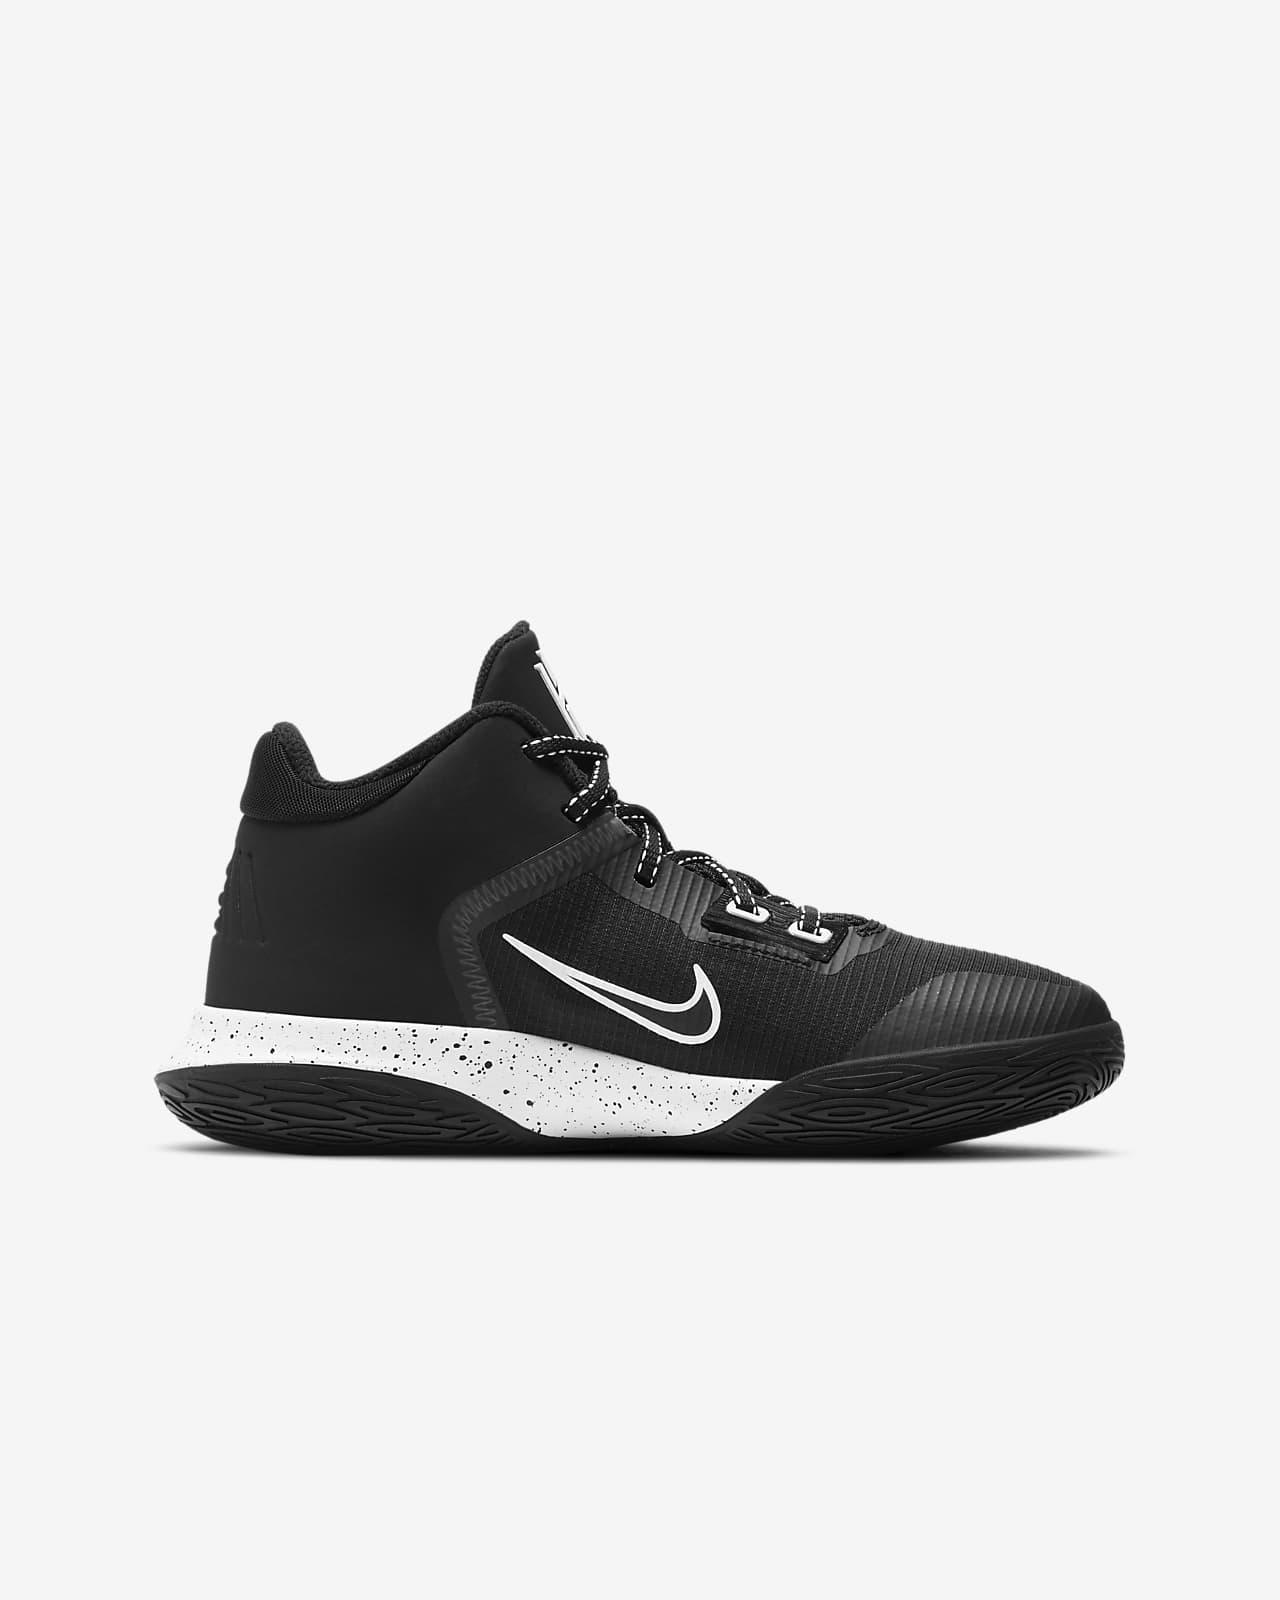 Big Kids' Basketball Shoe. Nike JP